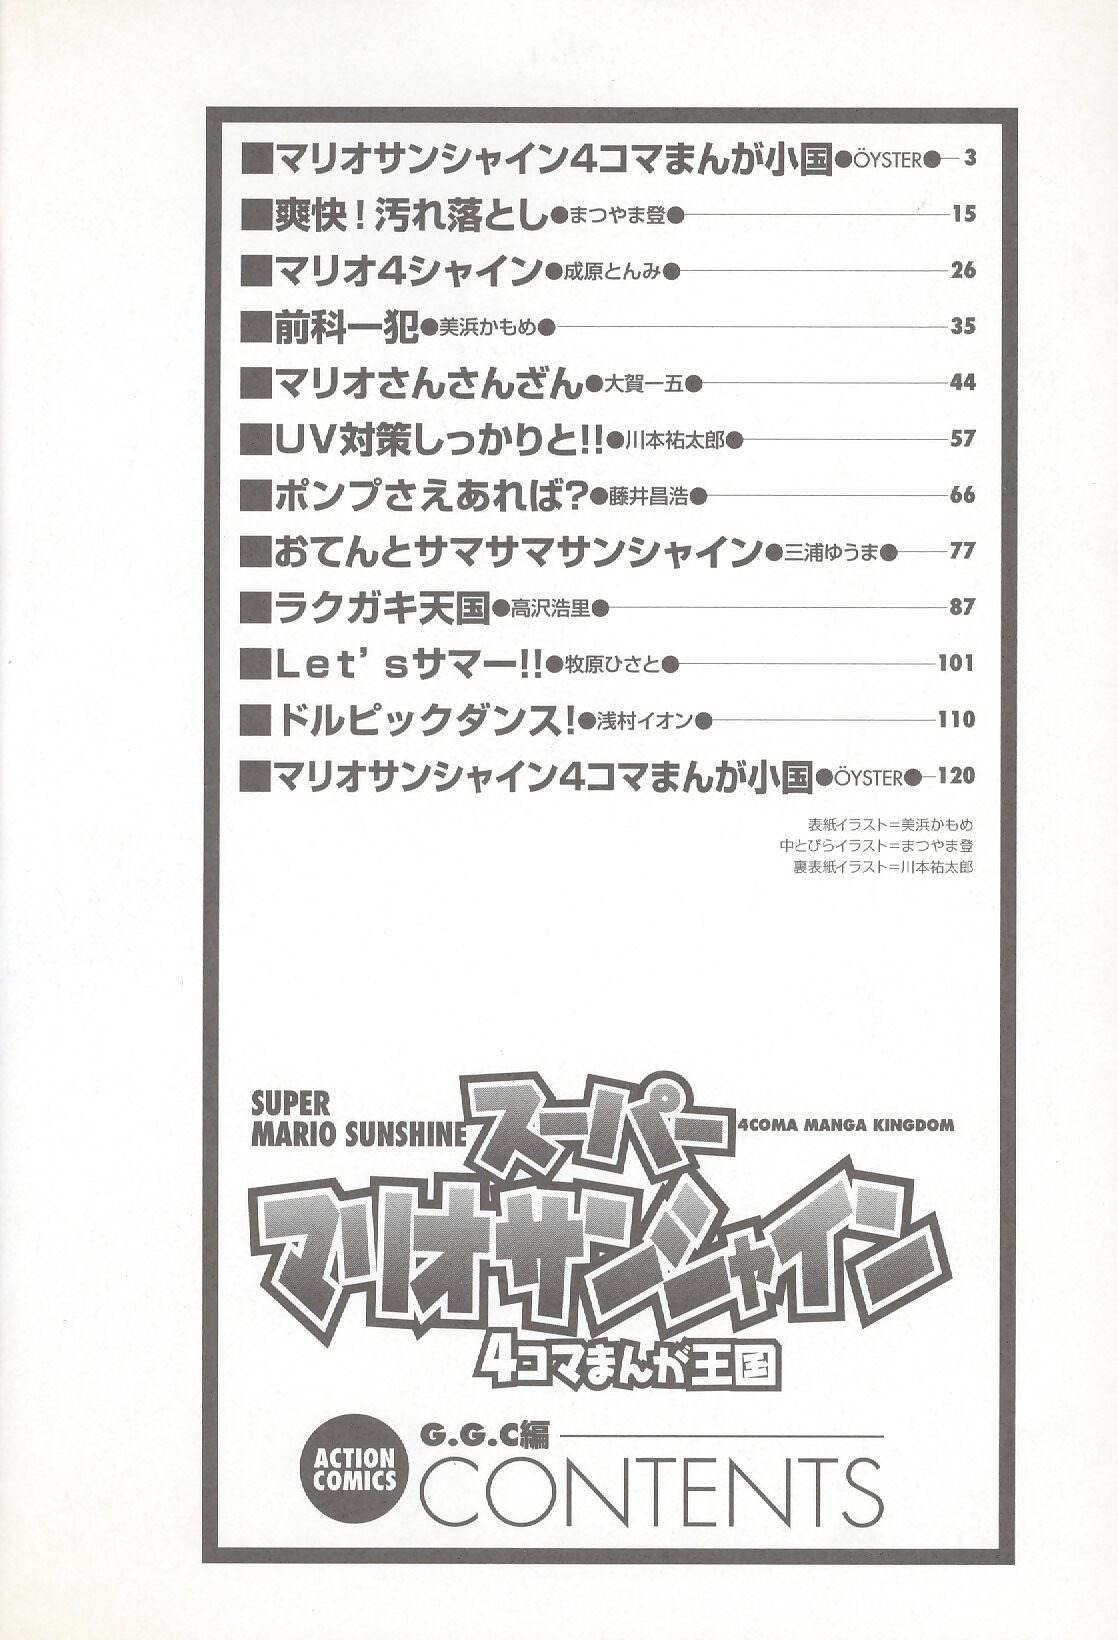 Prexy Mario Full view 4koma Manga Specialization